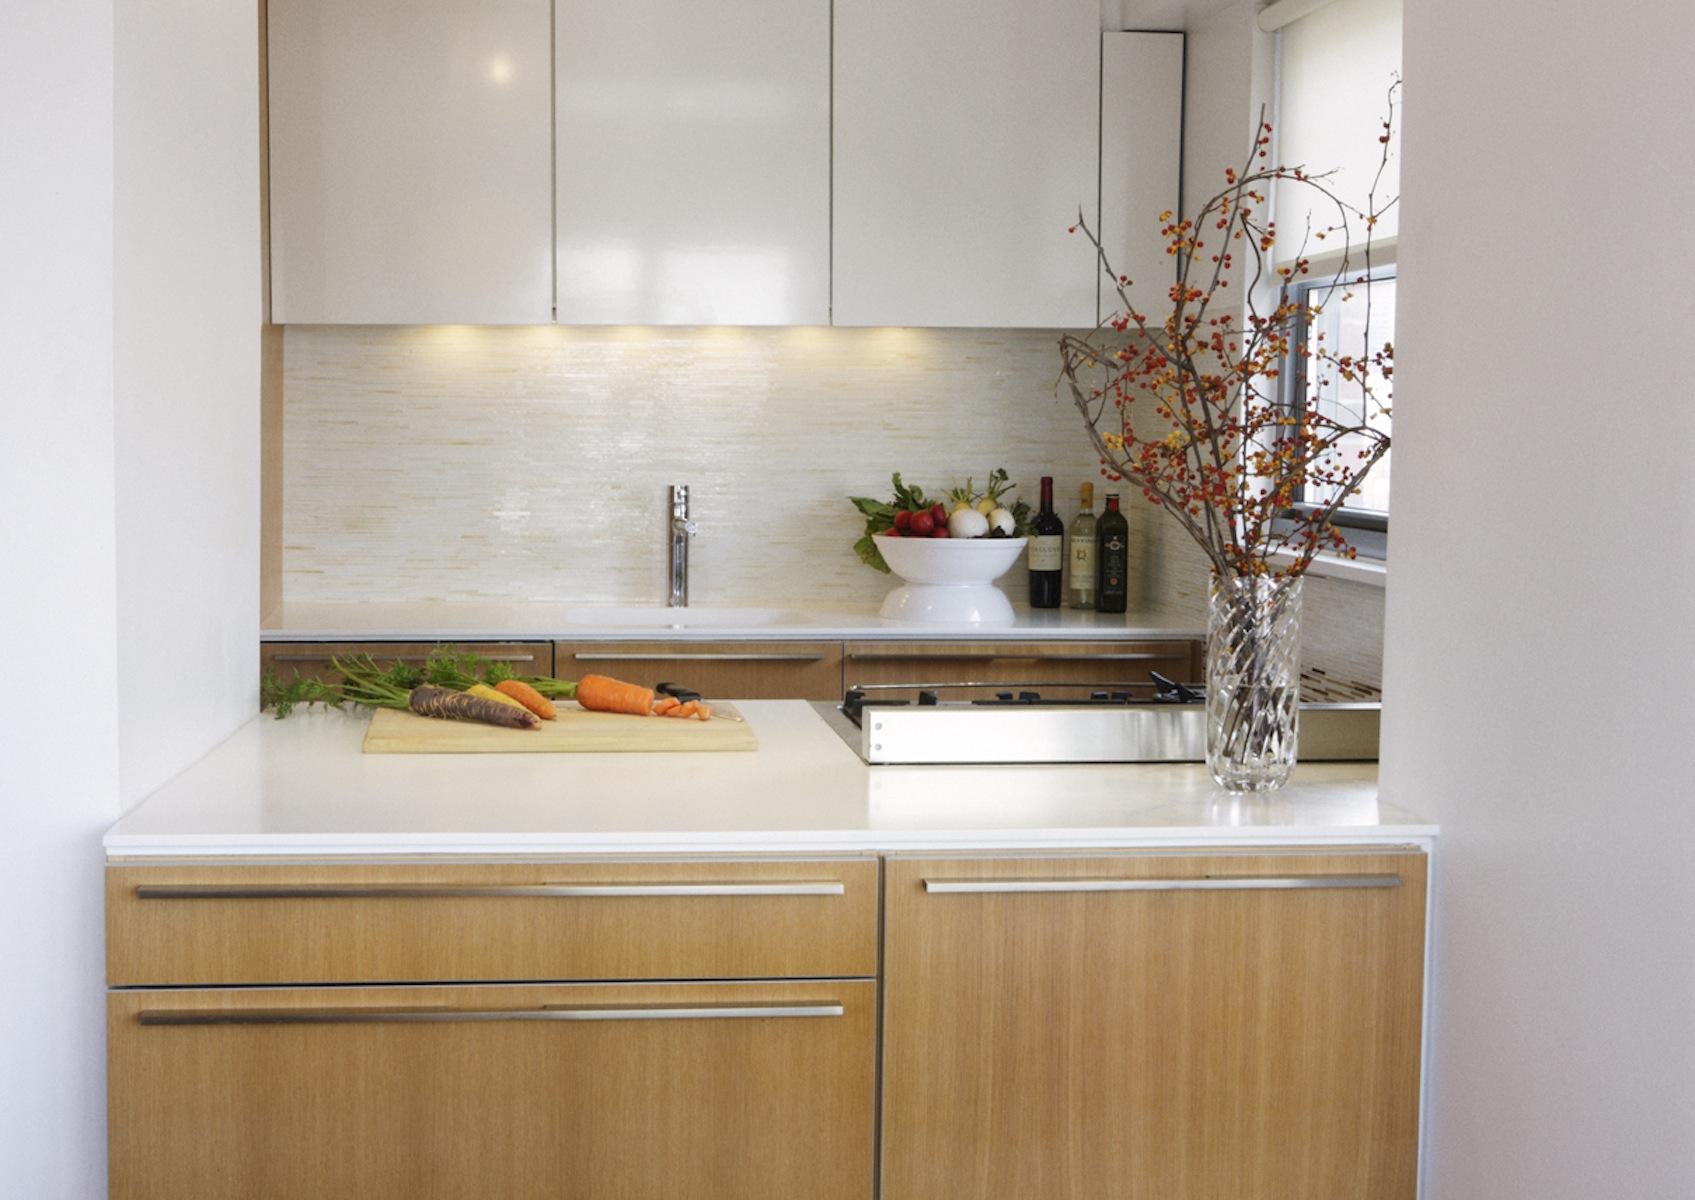 2 Kitchen.jpeg